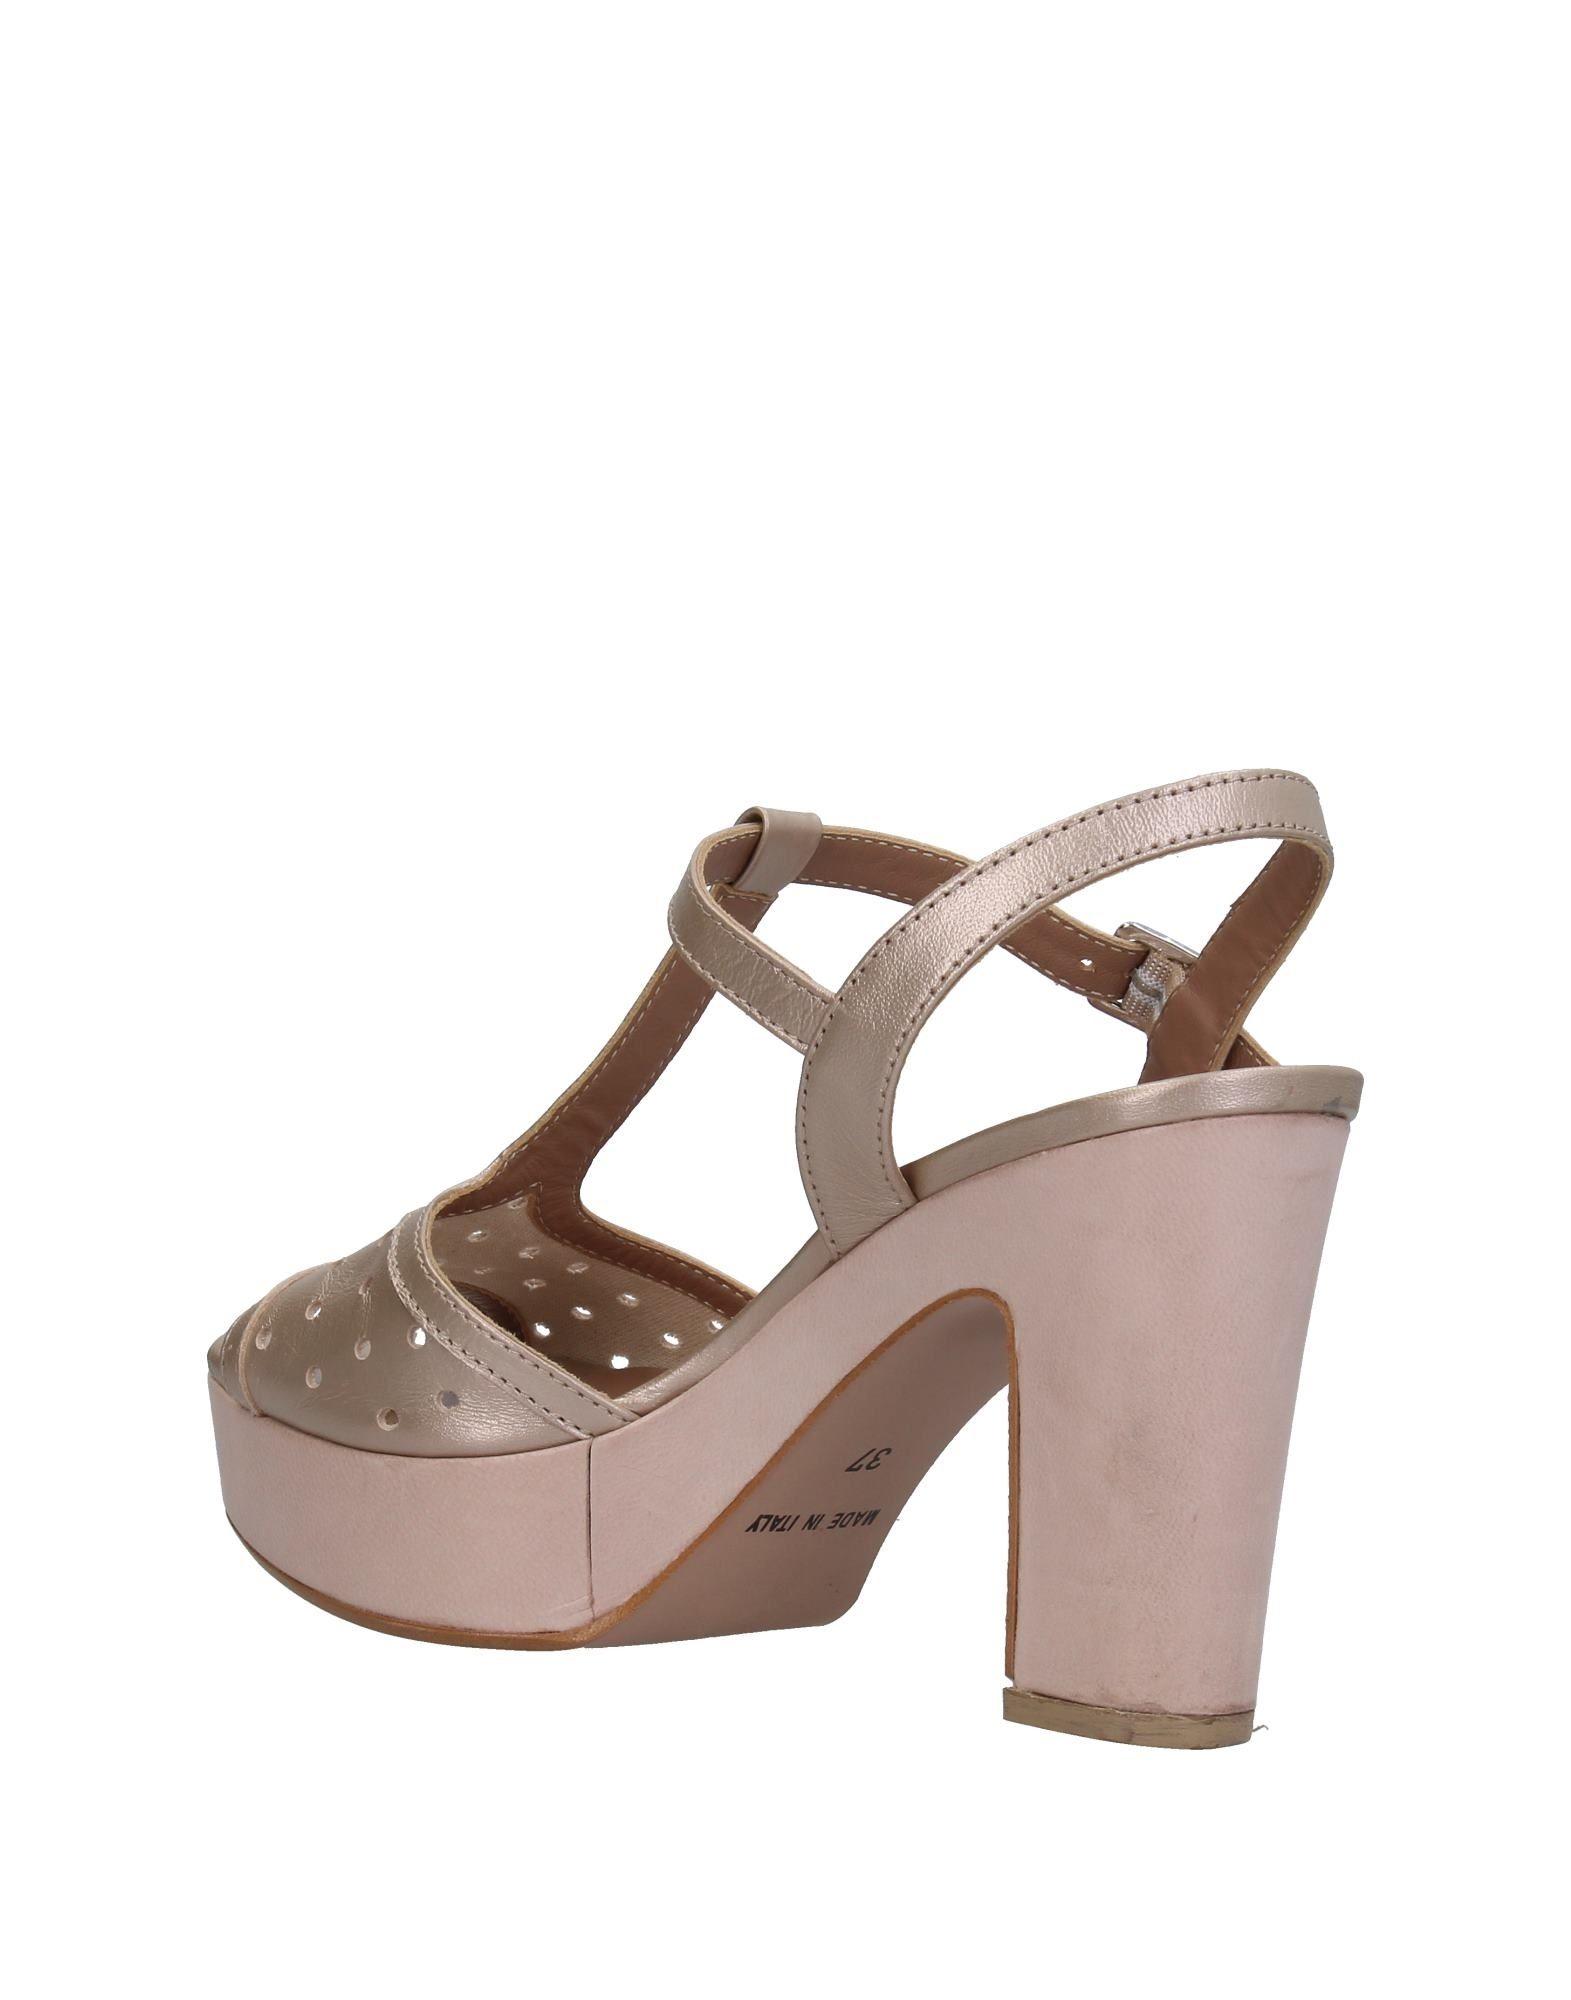 Mally Sandalen Damen  11375841EH Gute beliebte Qualität beliebte Gute Schuhe 56f5c2